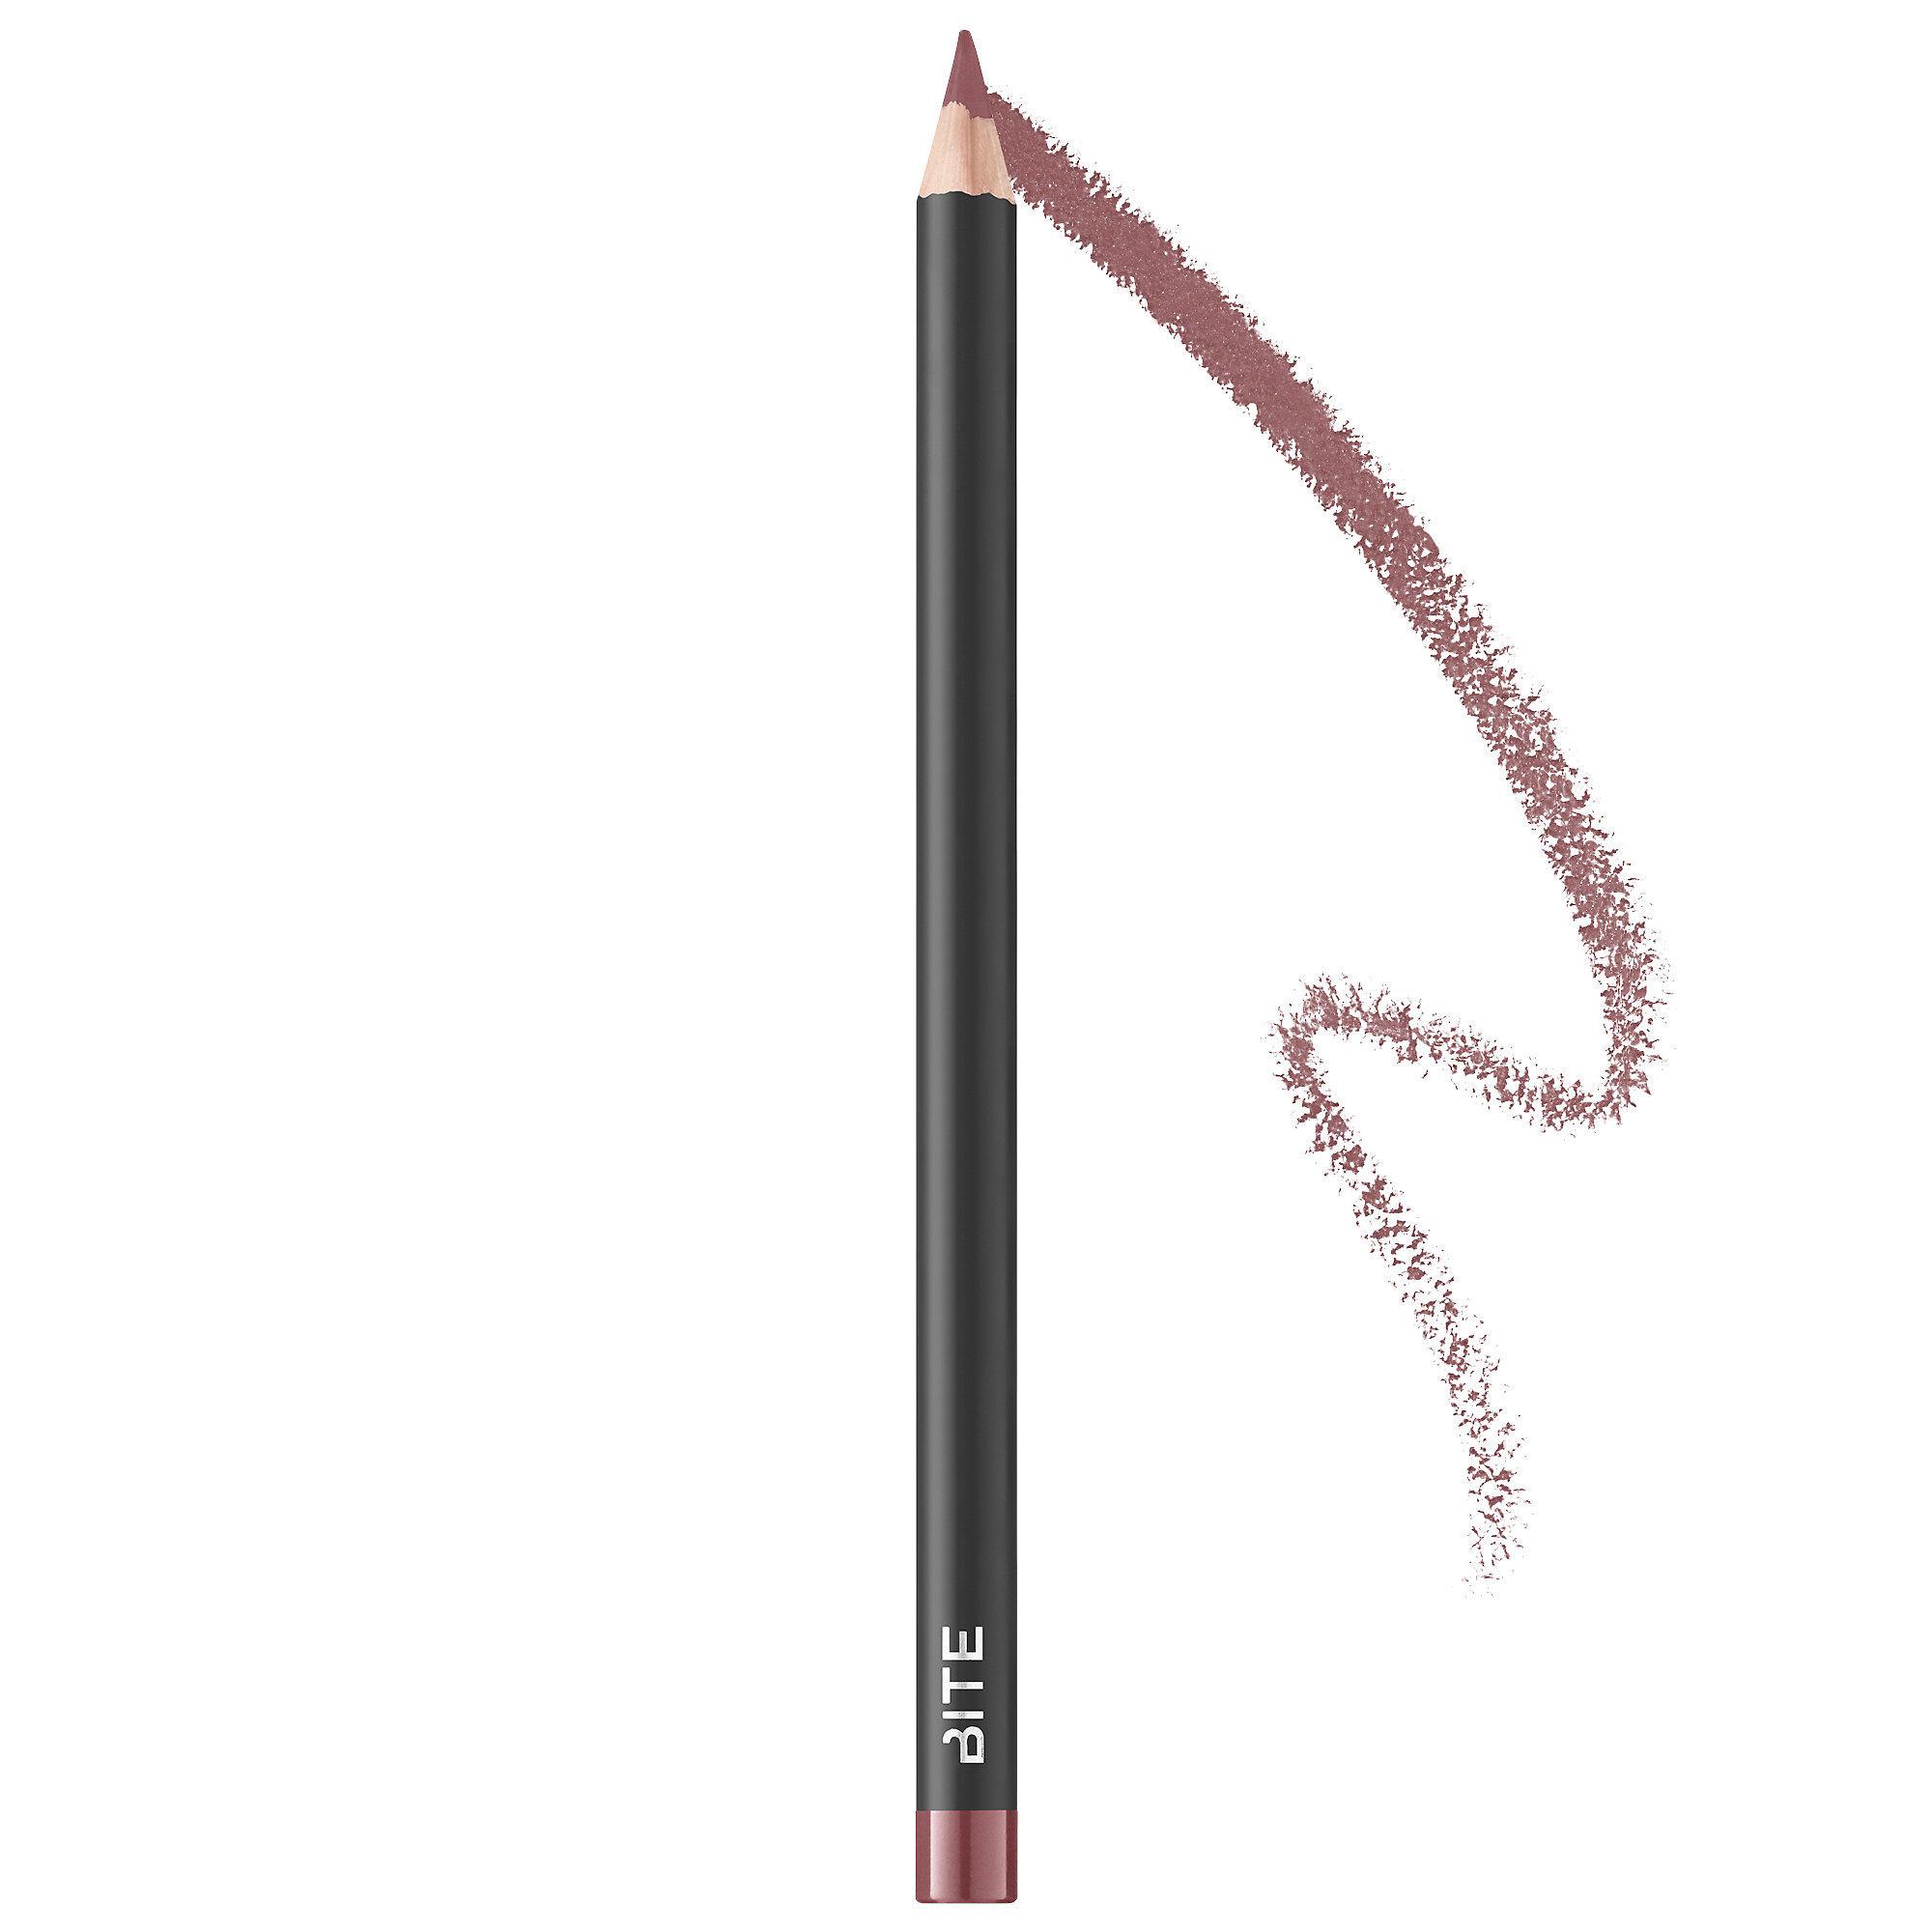 Bite Beauty The Lip Pencil Plum Taupe 012